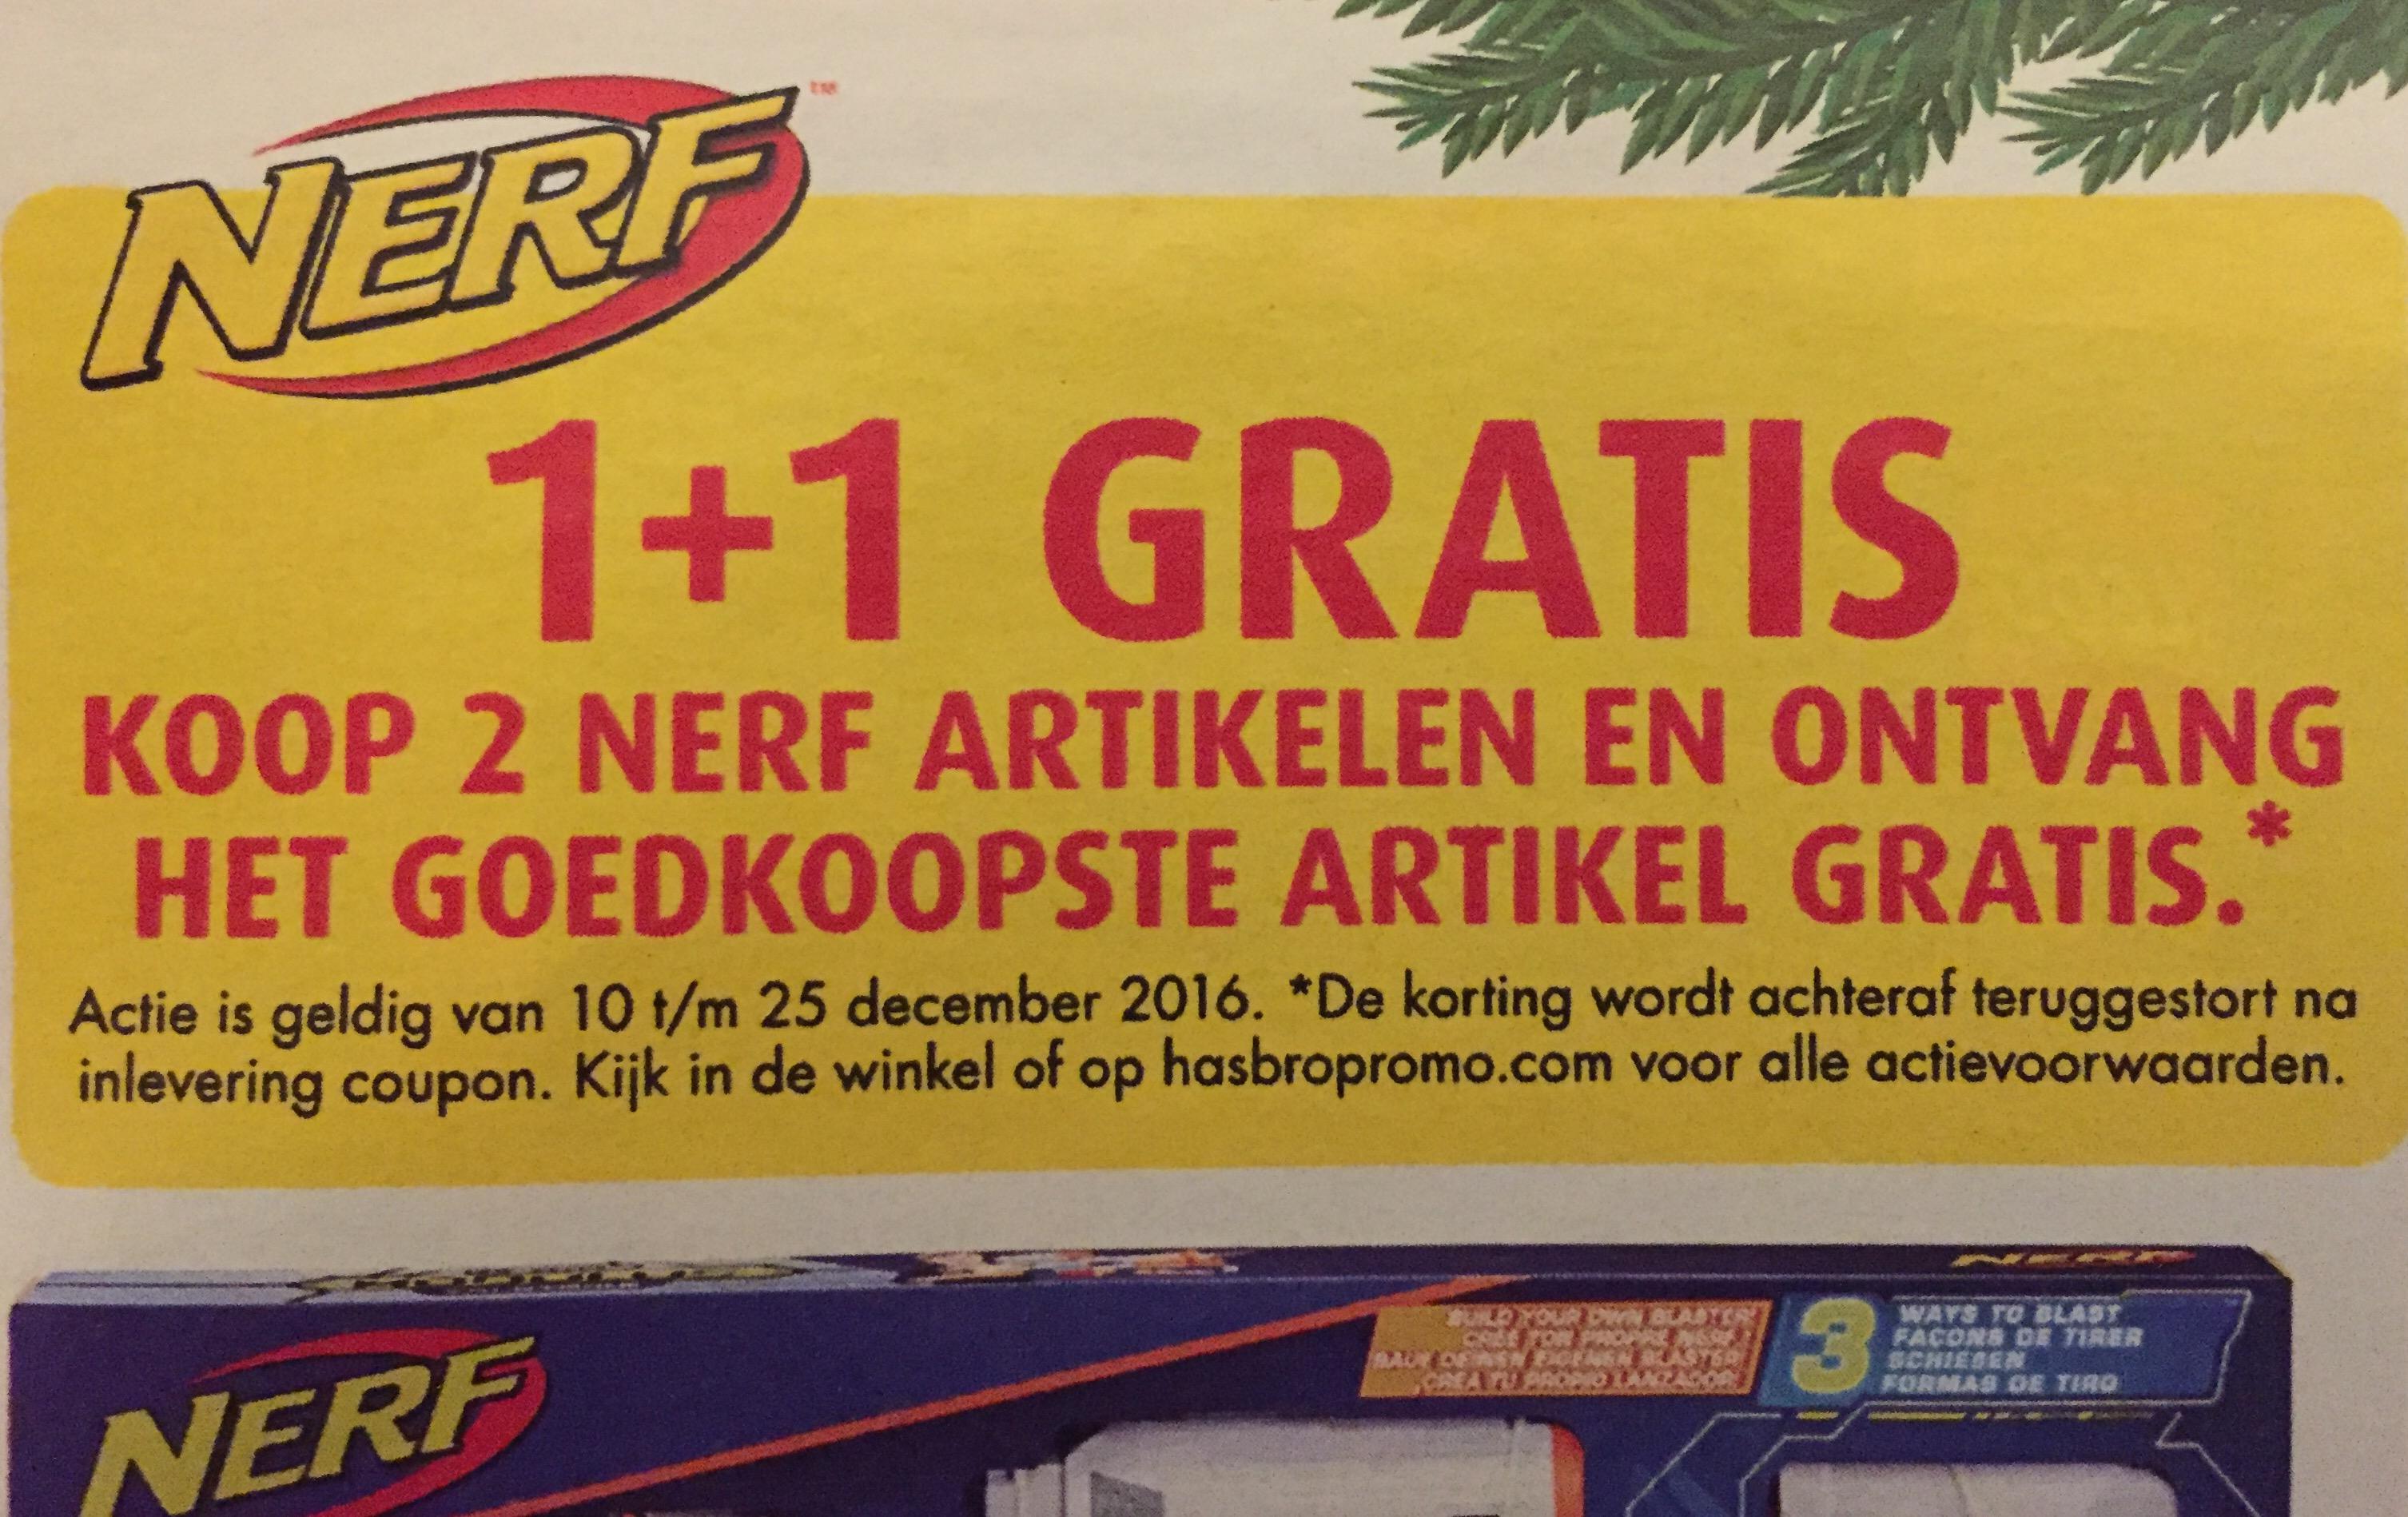 NERF 1+1 gratis @ Bart Smit en Intertoys